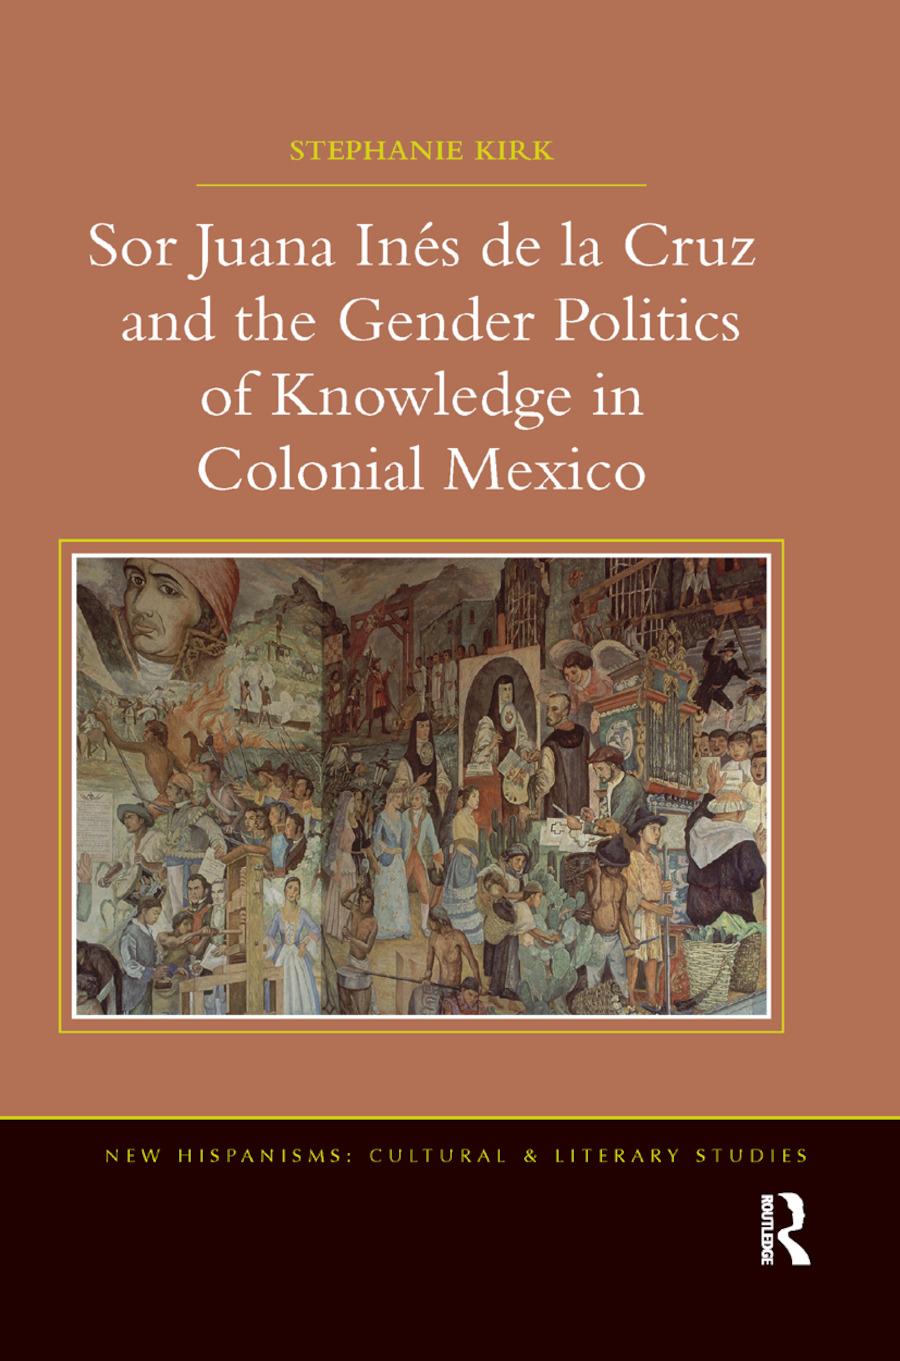 Sor Juana In�de la Cruz and the Gender Politics of Knowledge in Colonial Mexico book cover